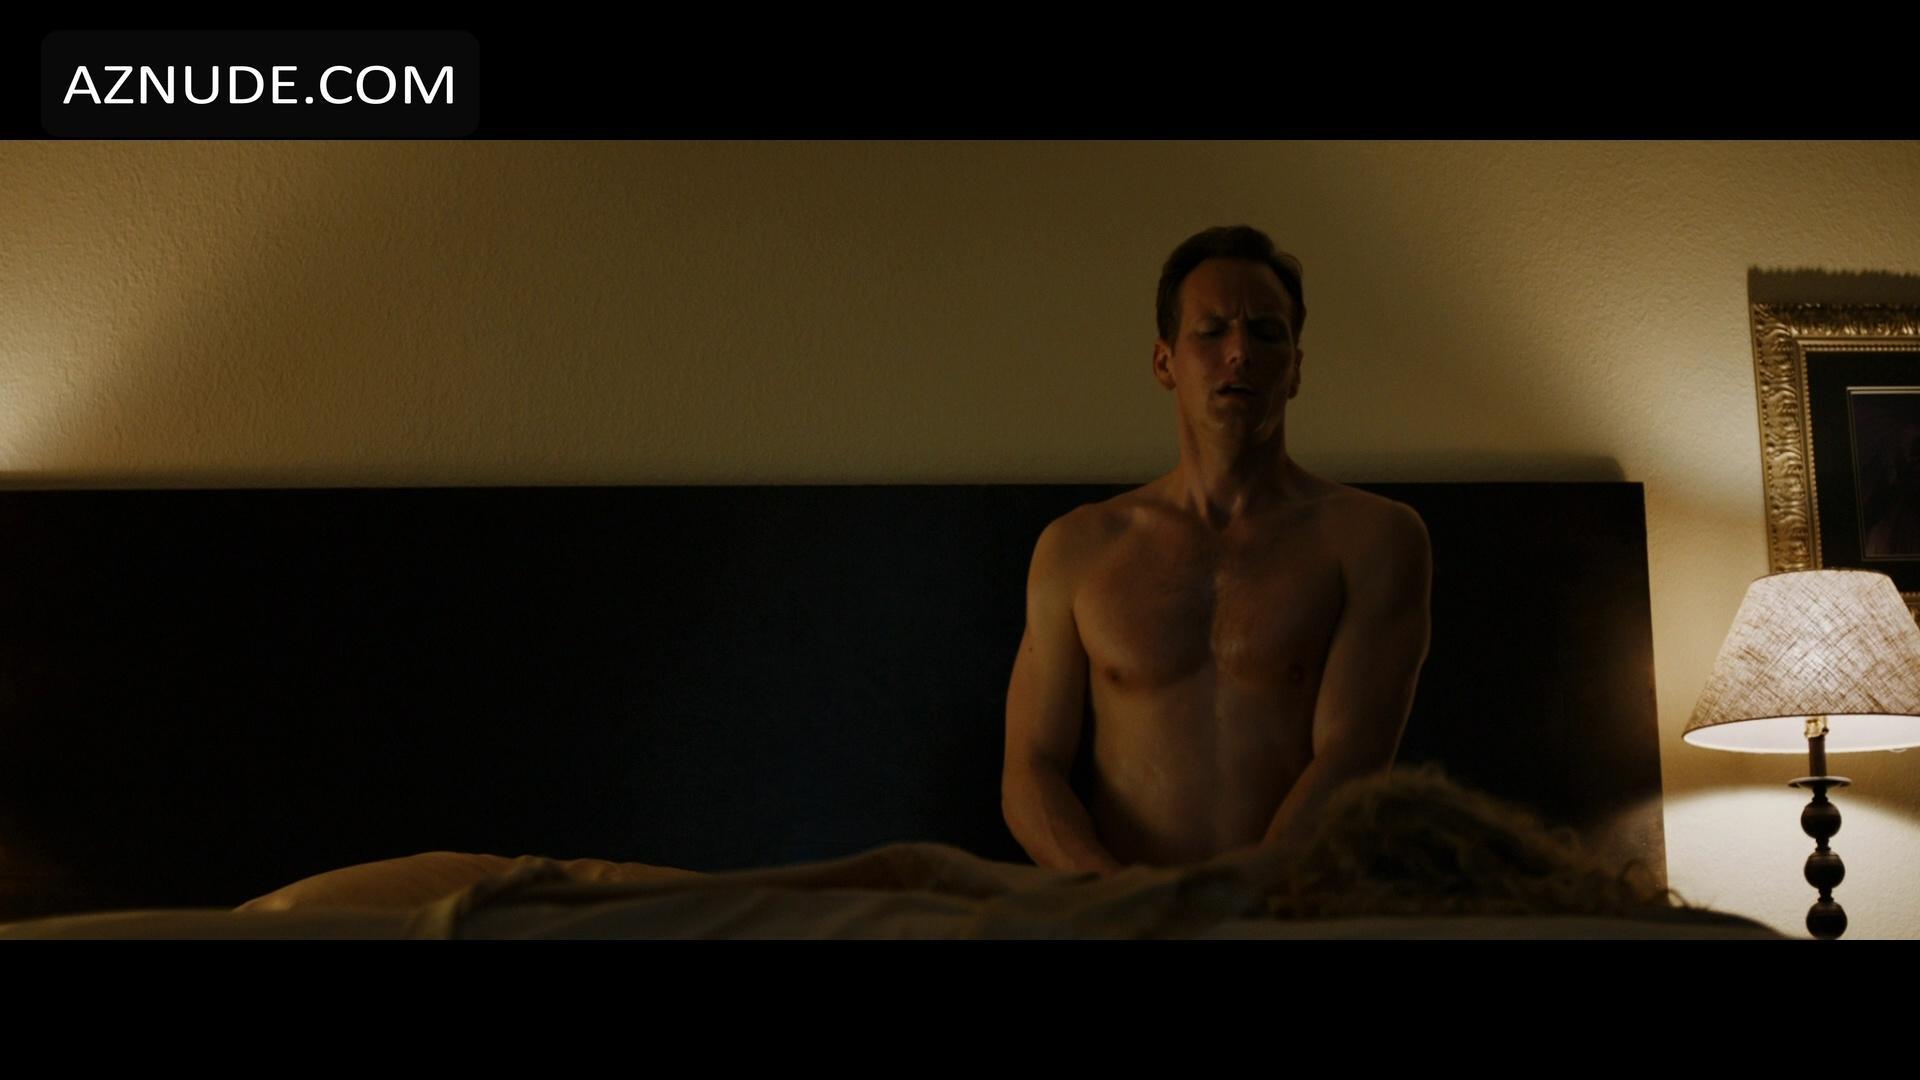 patrick wilson nackt